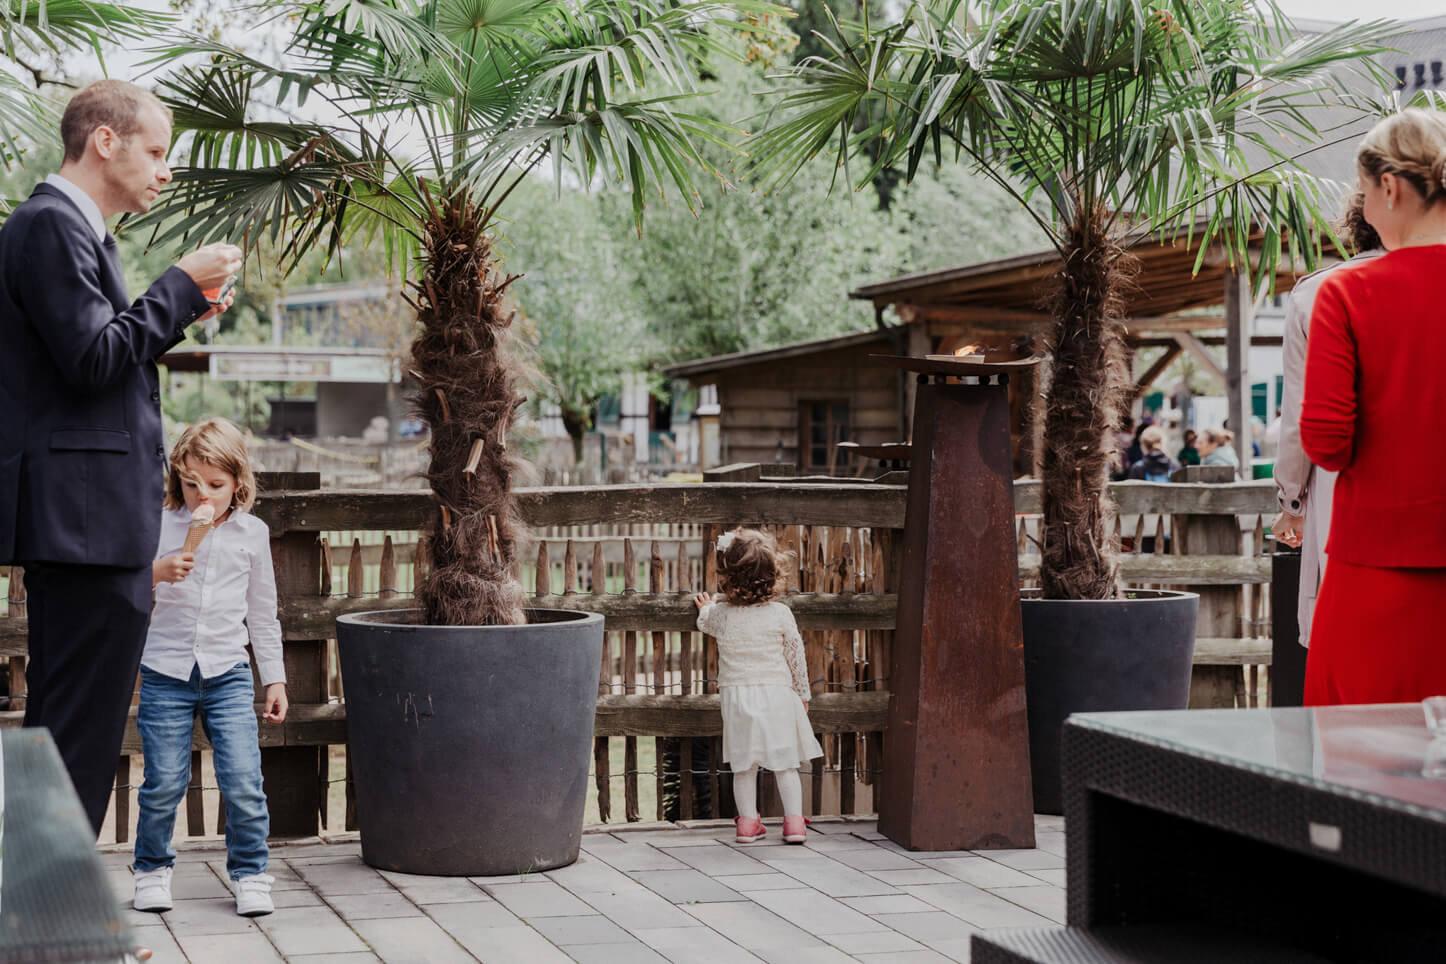 Terasse im Zoo Event Köln